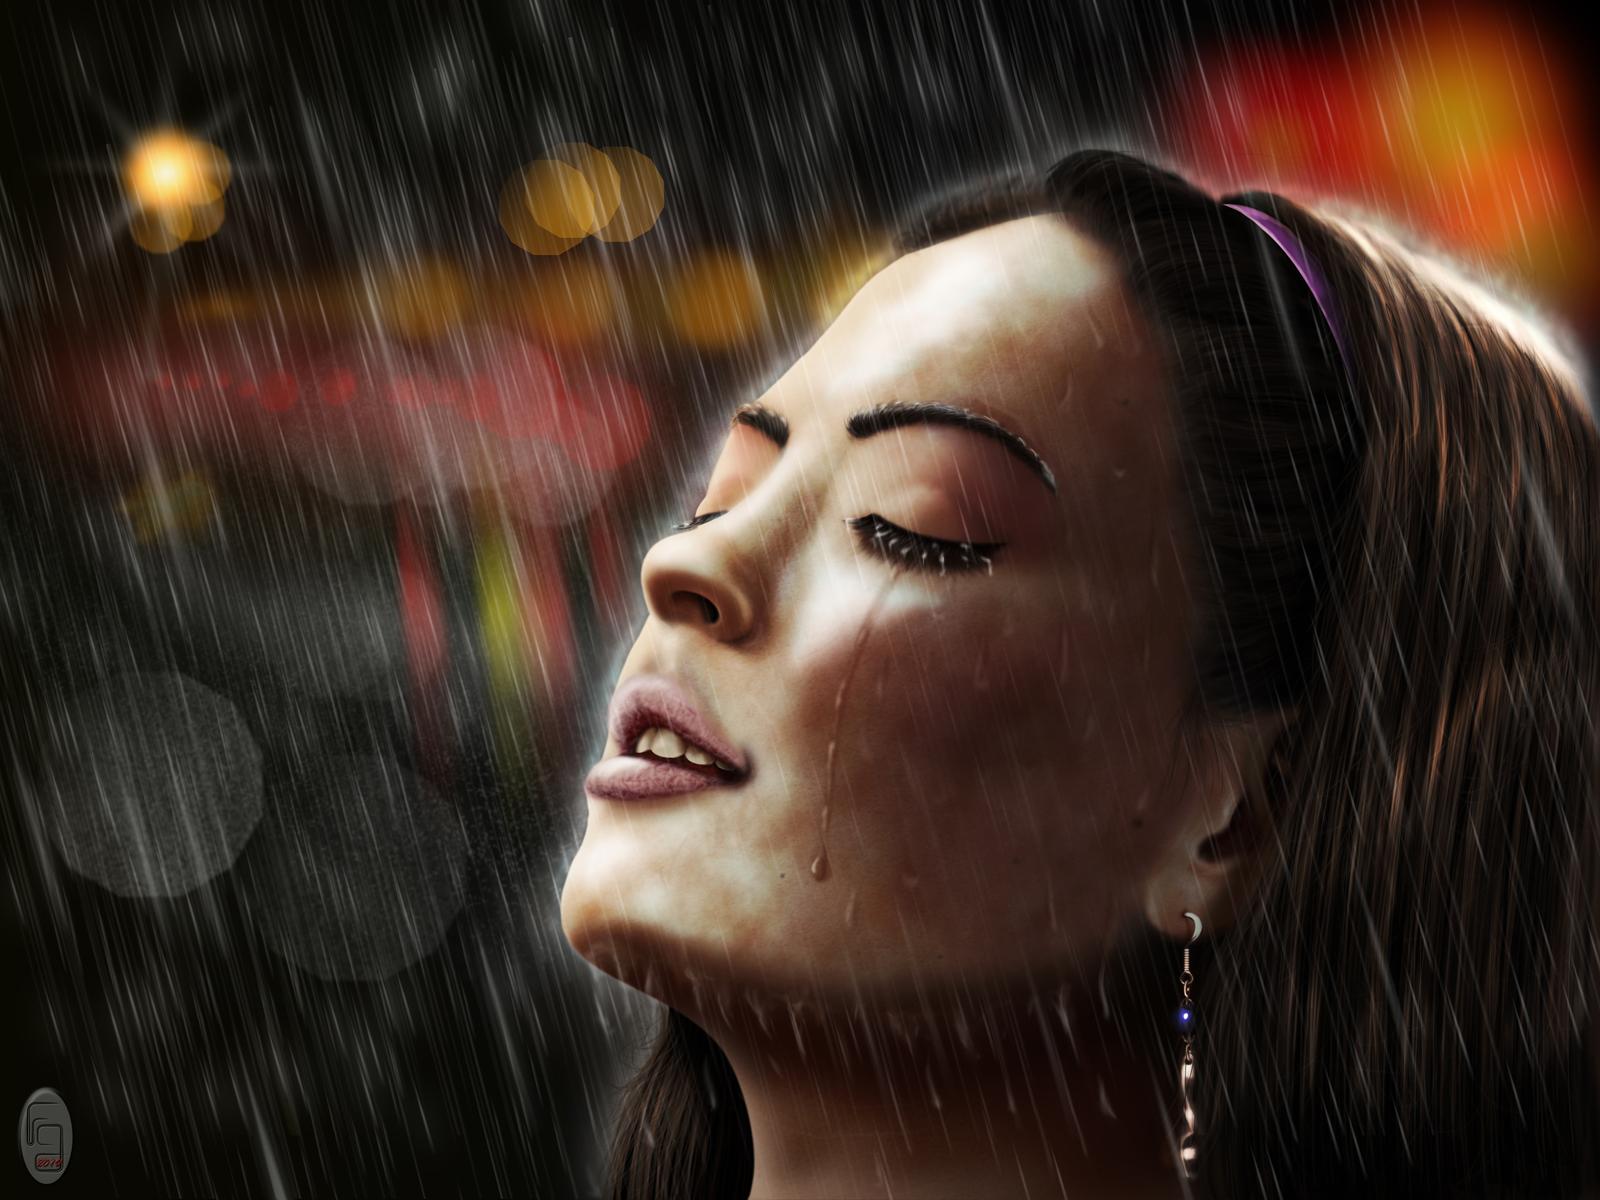 Šta je pisac hteo da kaže? - Majacvet - Page 4 Tears_in_the_rain_by_fabius72-d32cj8l